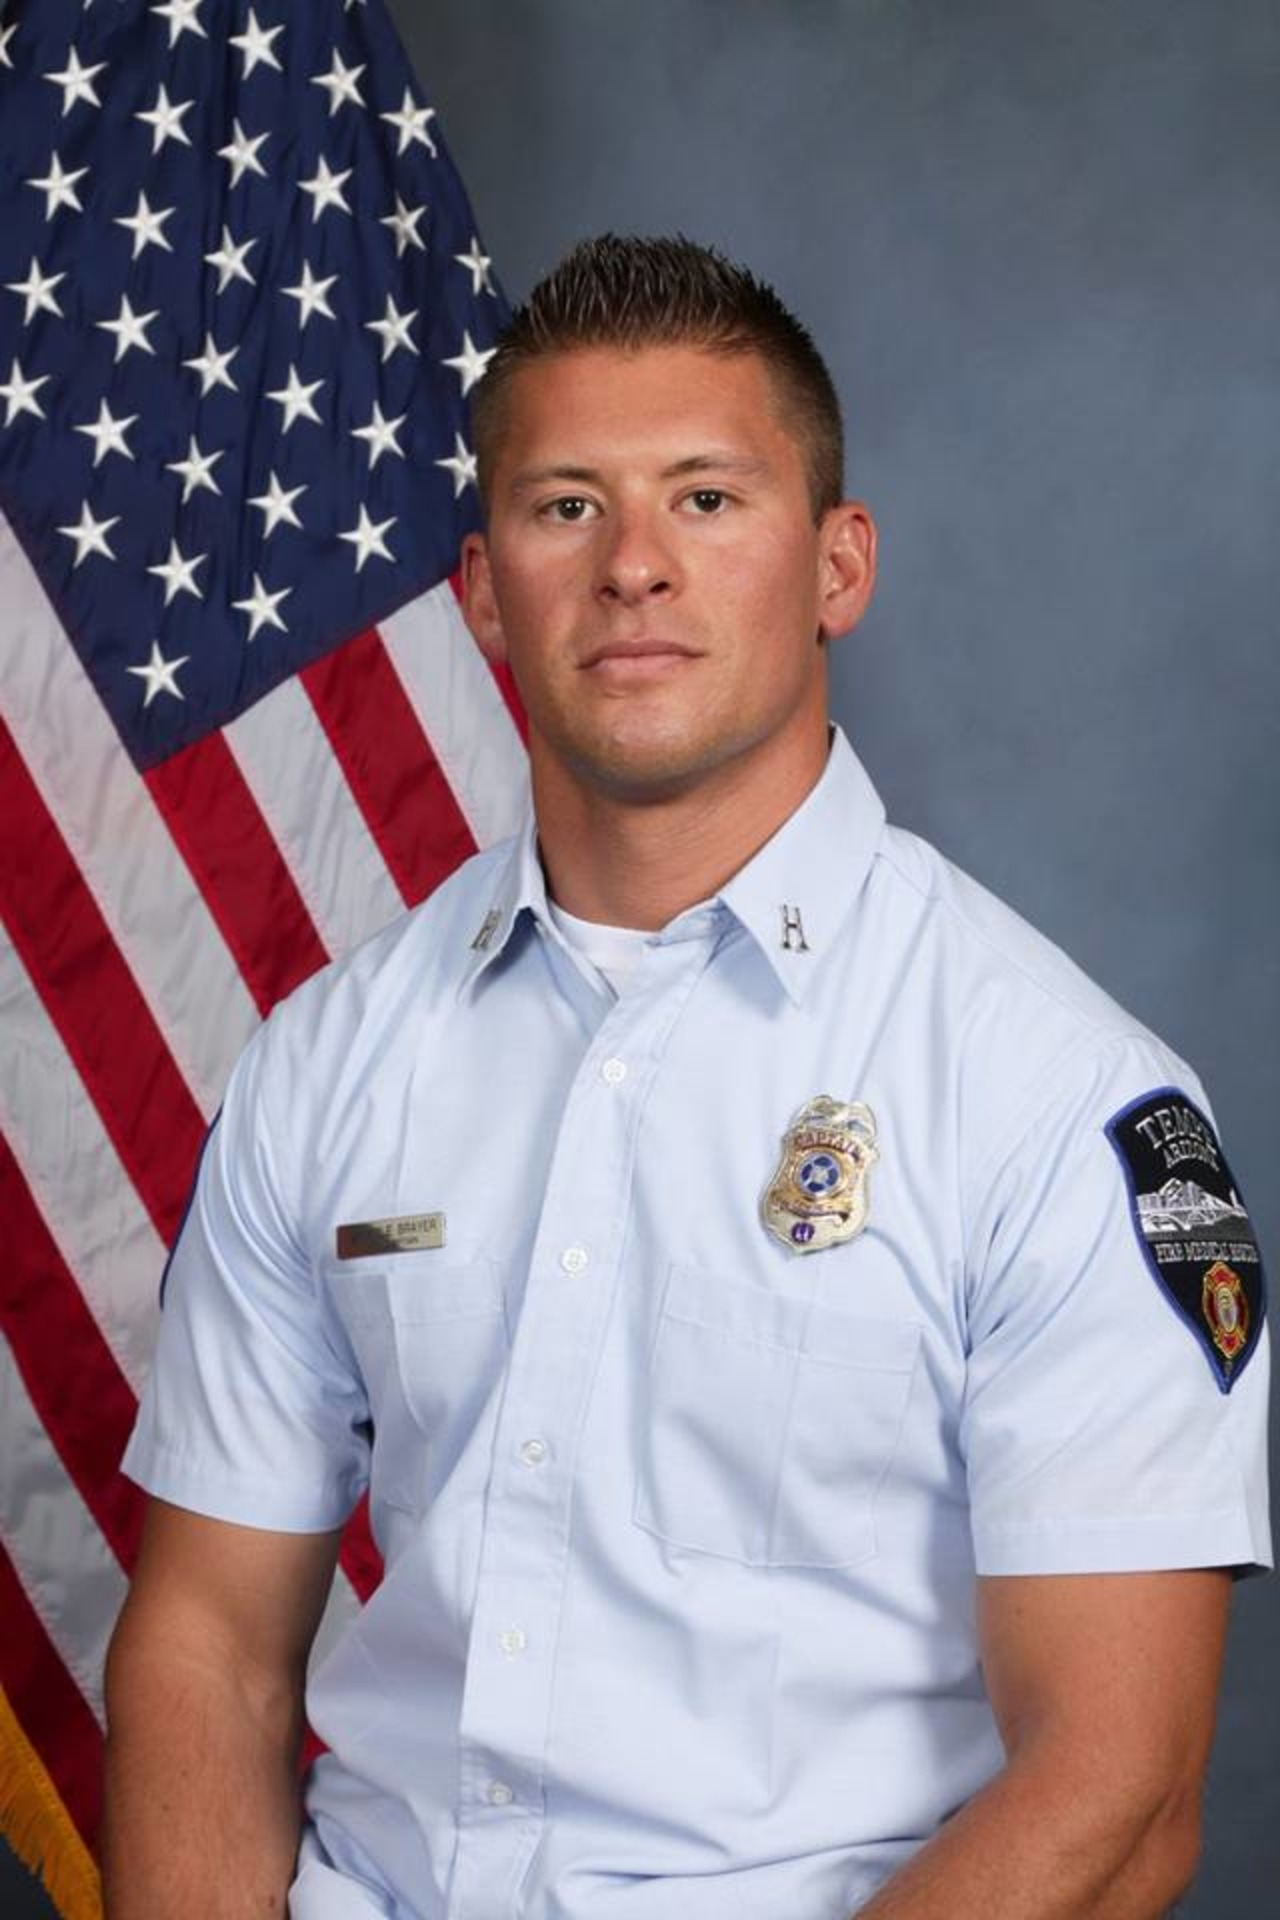 Off-Duty AZ Fire Captain Shot in Head, Dies After Traffic Incident